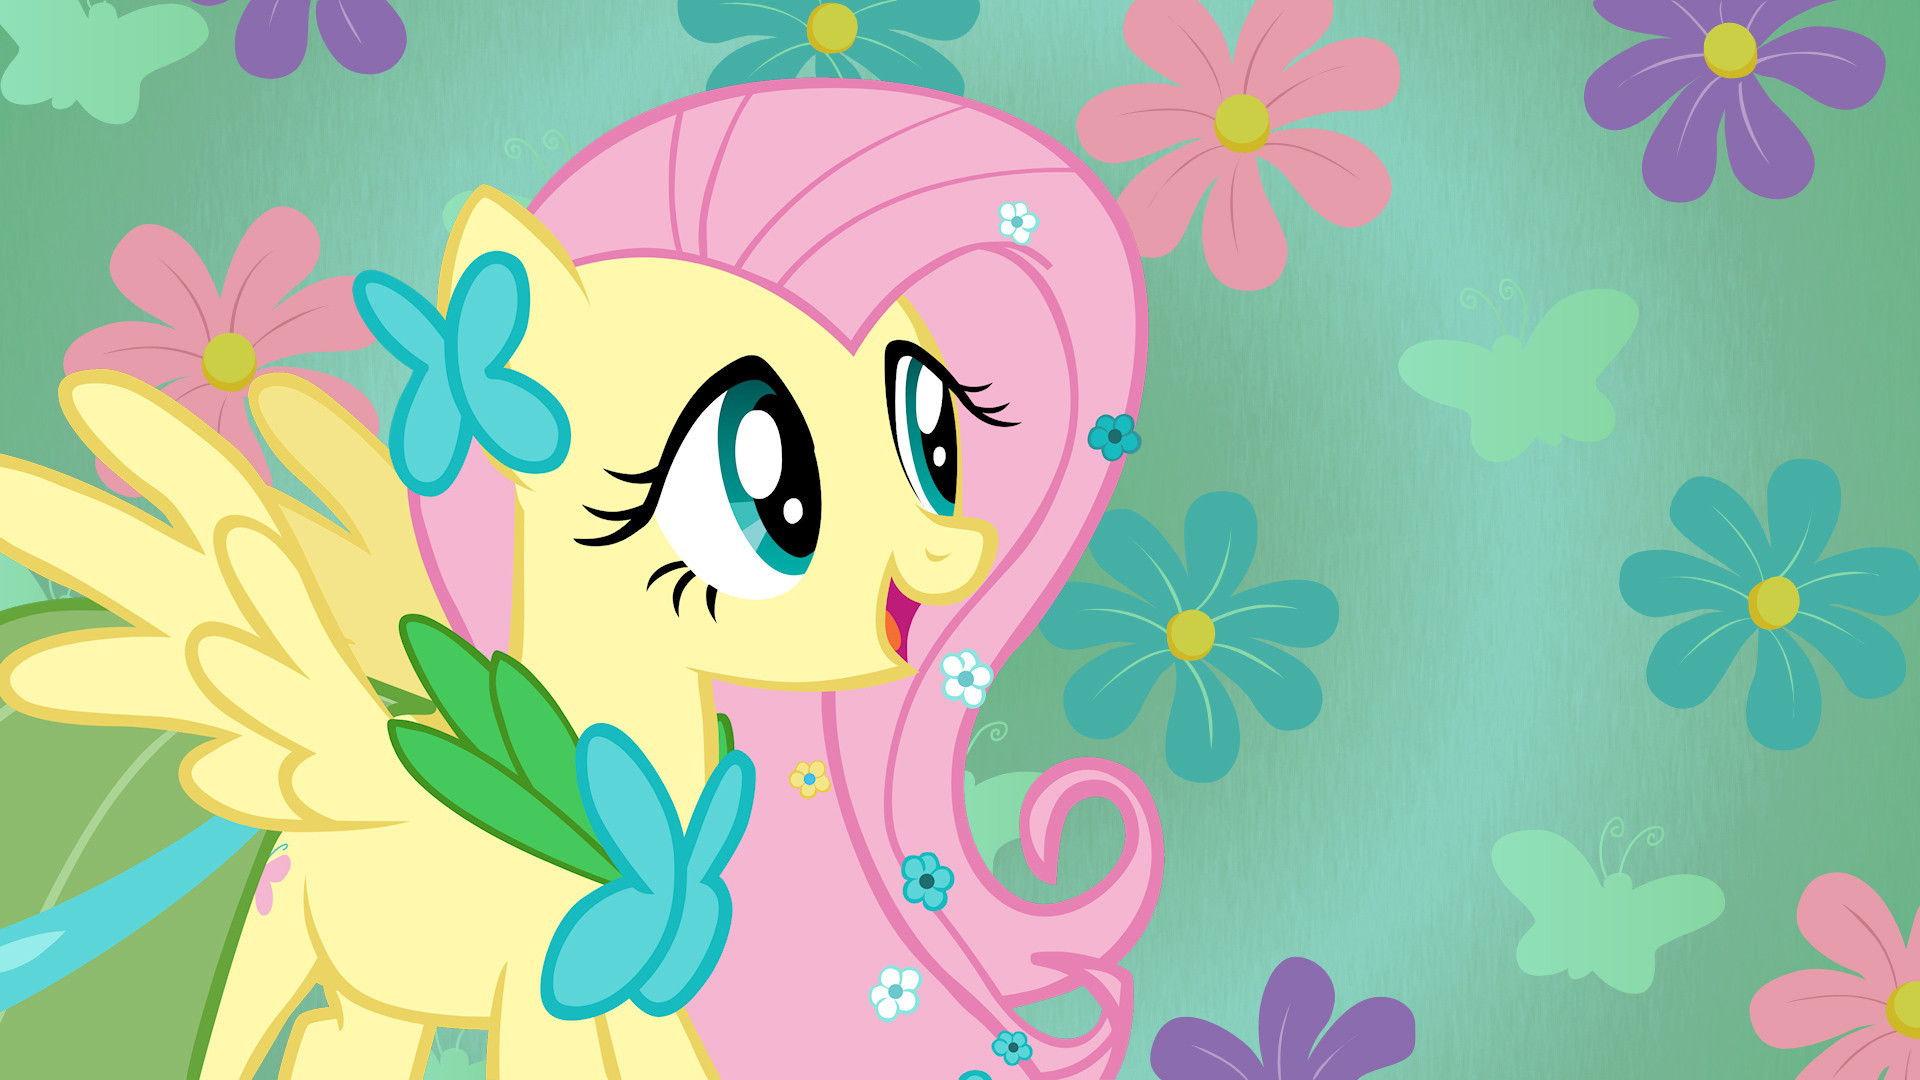 TV Show My Little Pony Friendship Is Magic 1920x1080